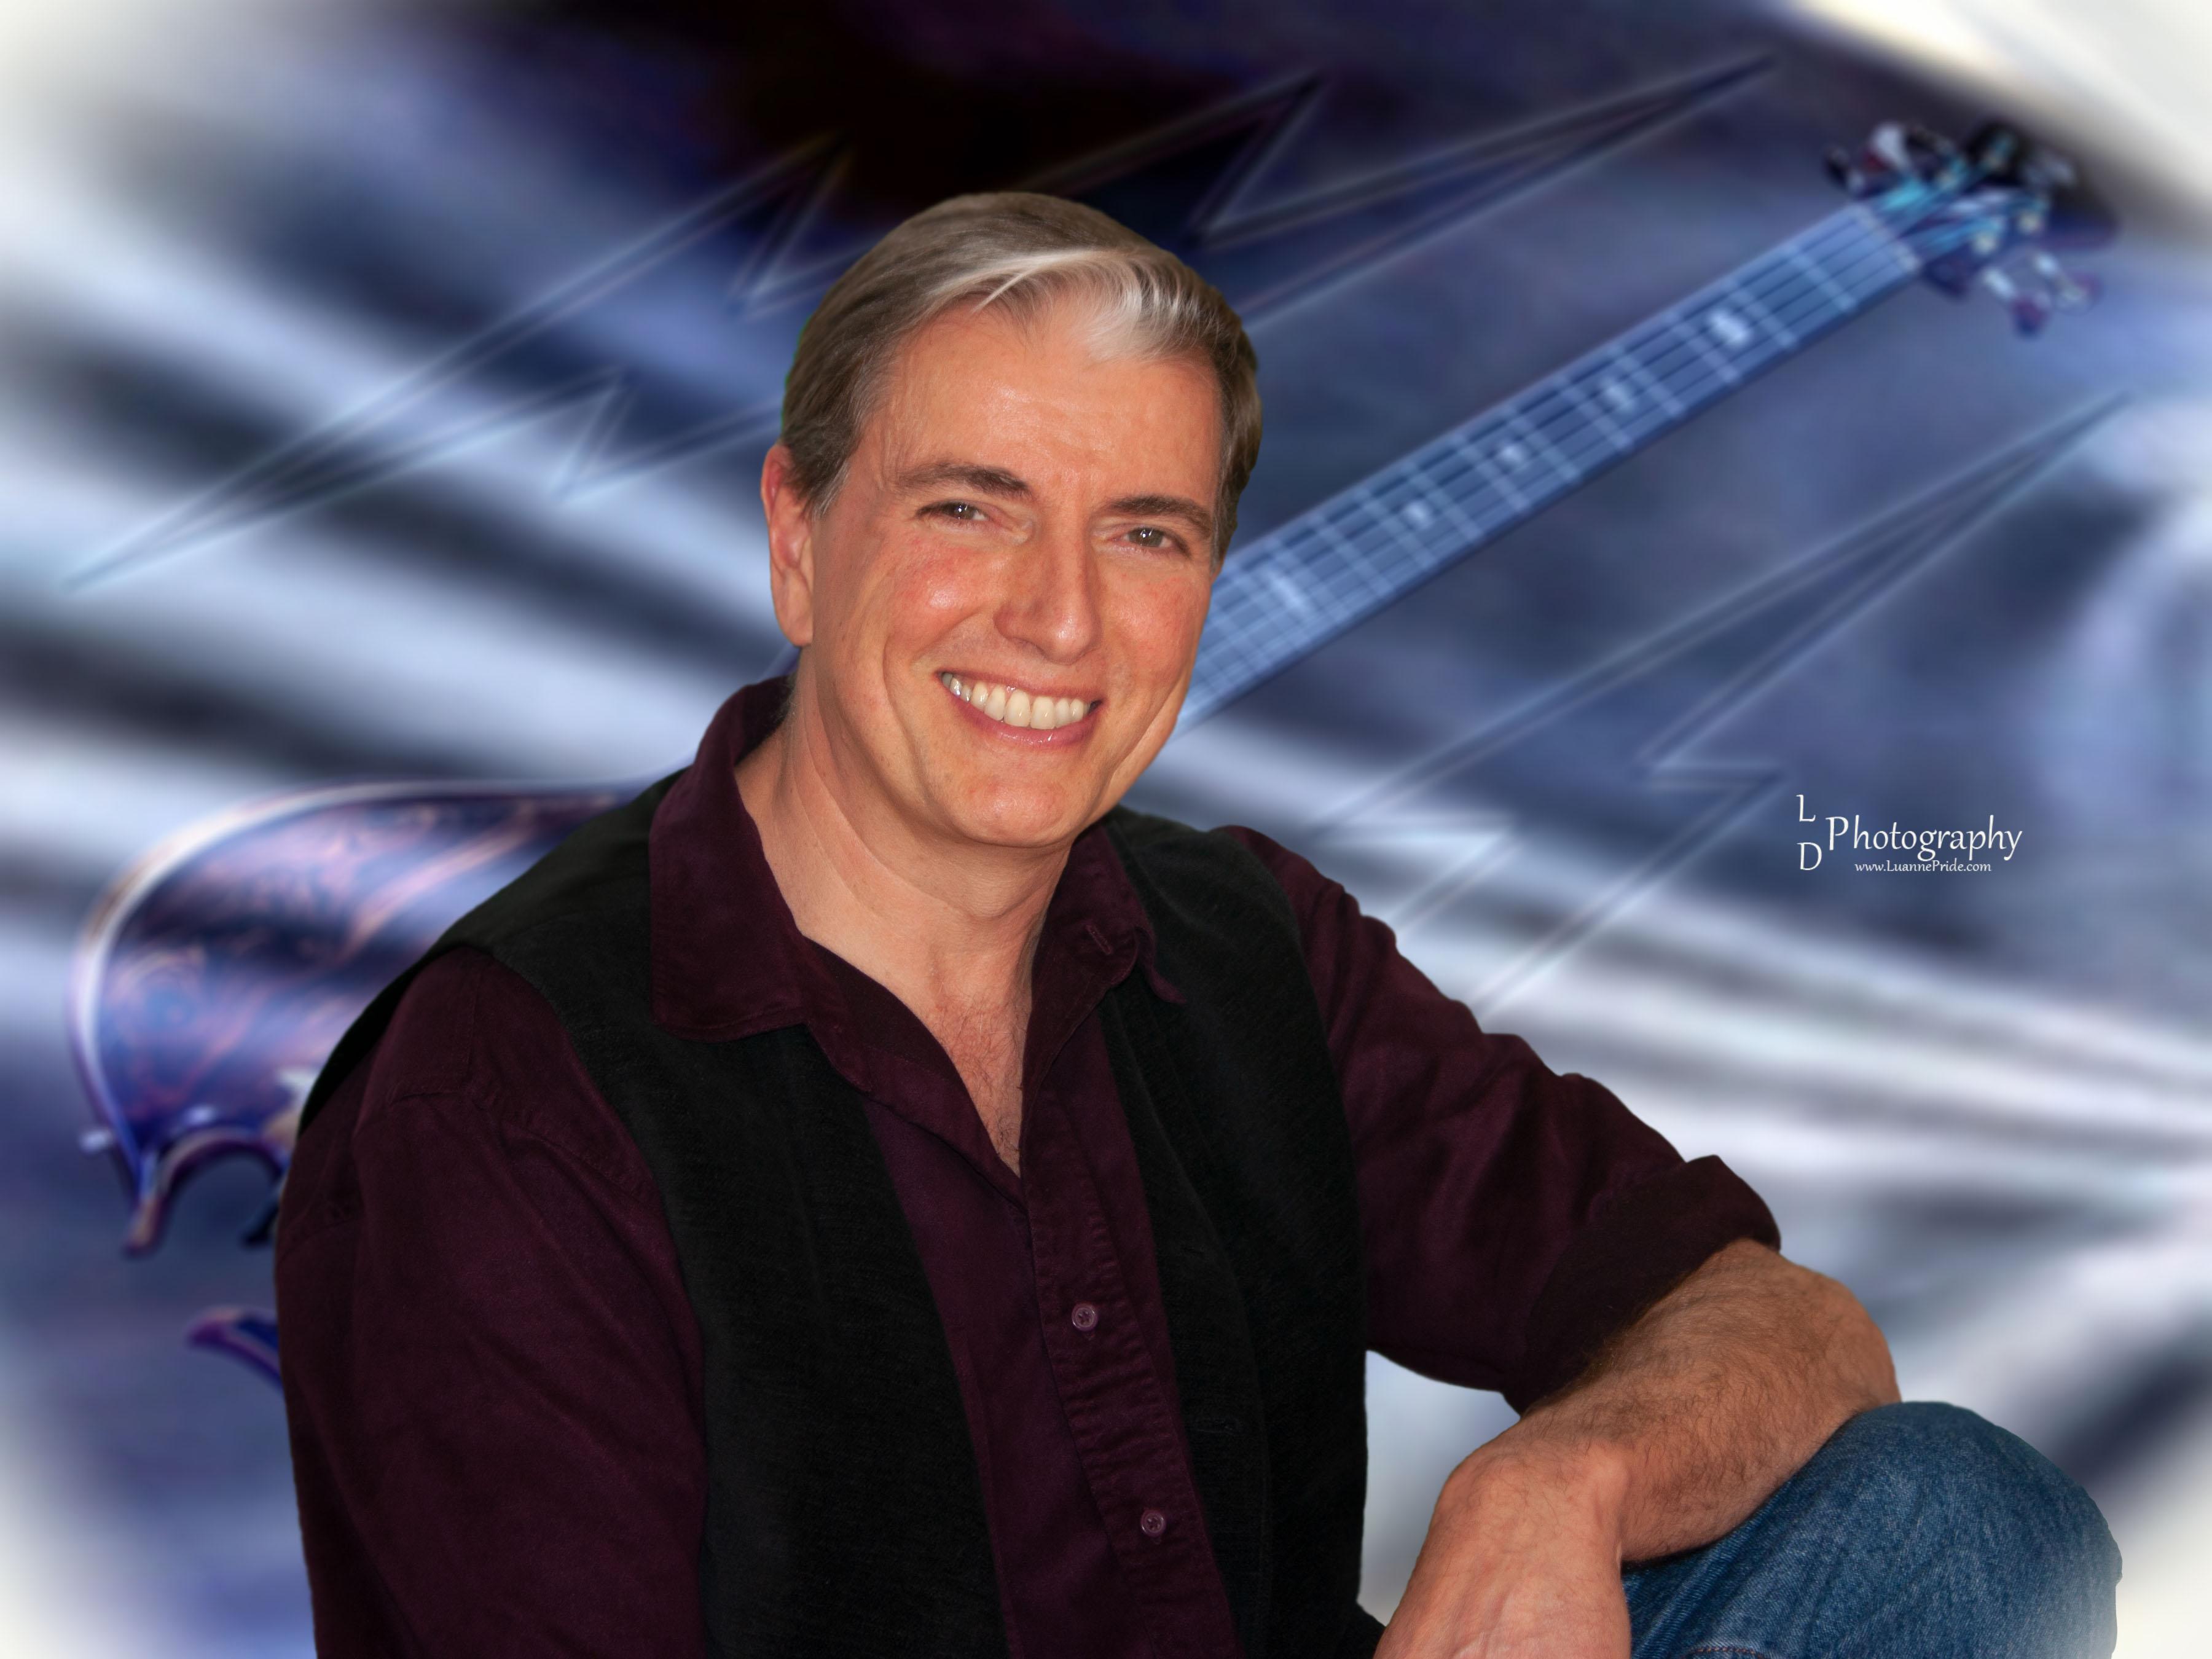 Tim Blue Guitar b